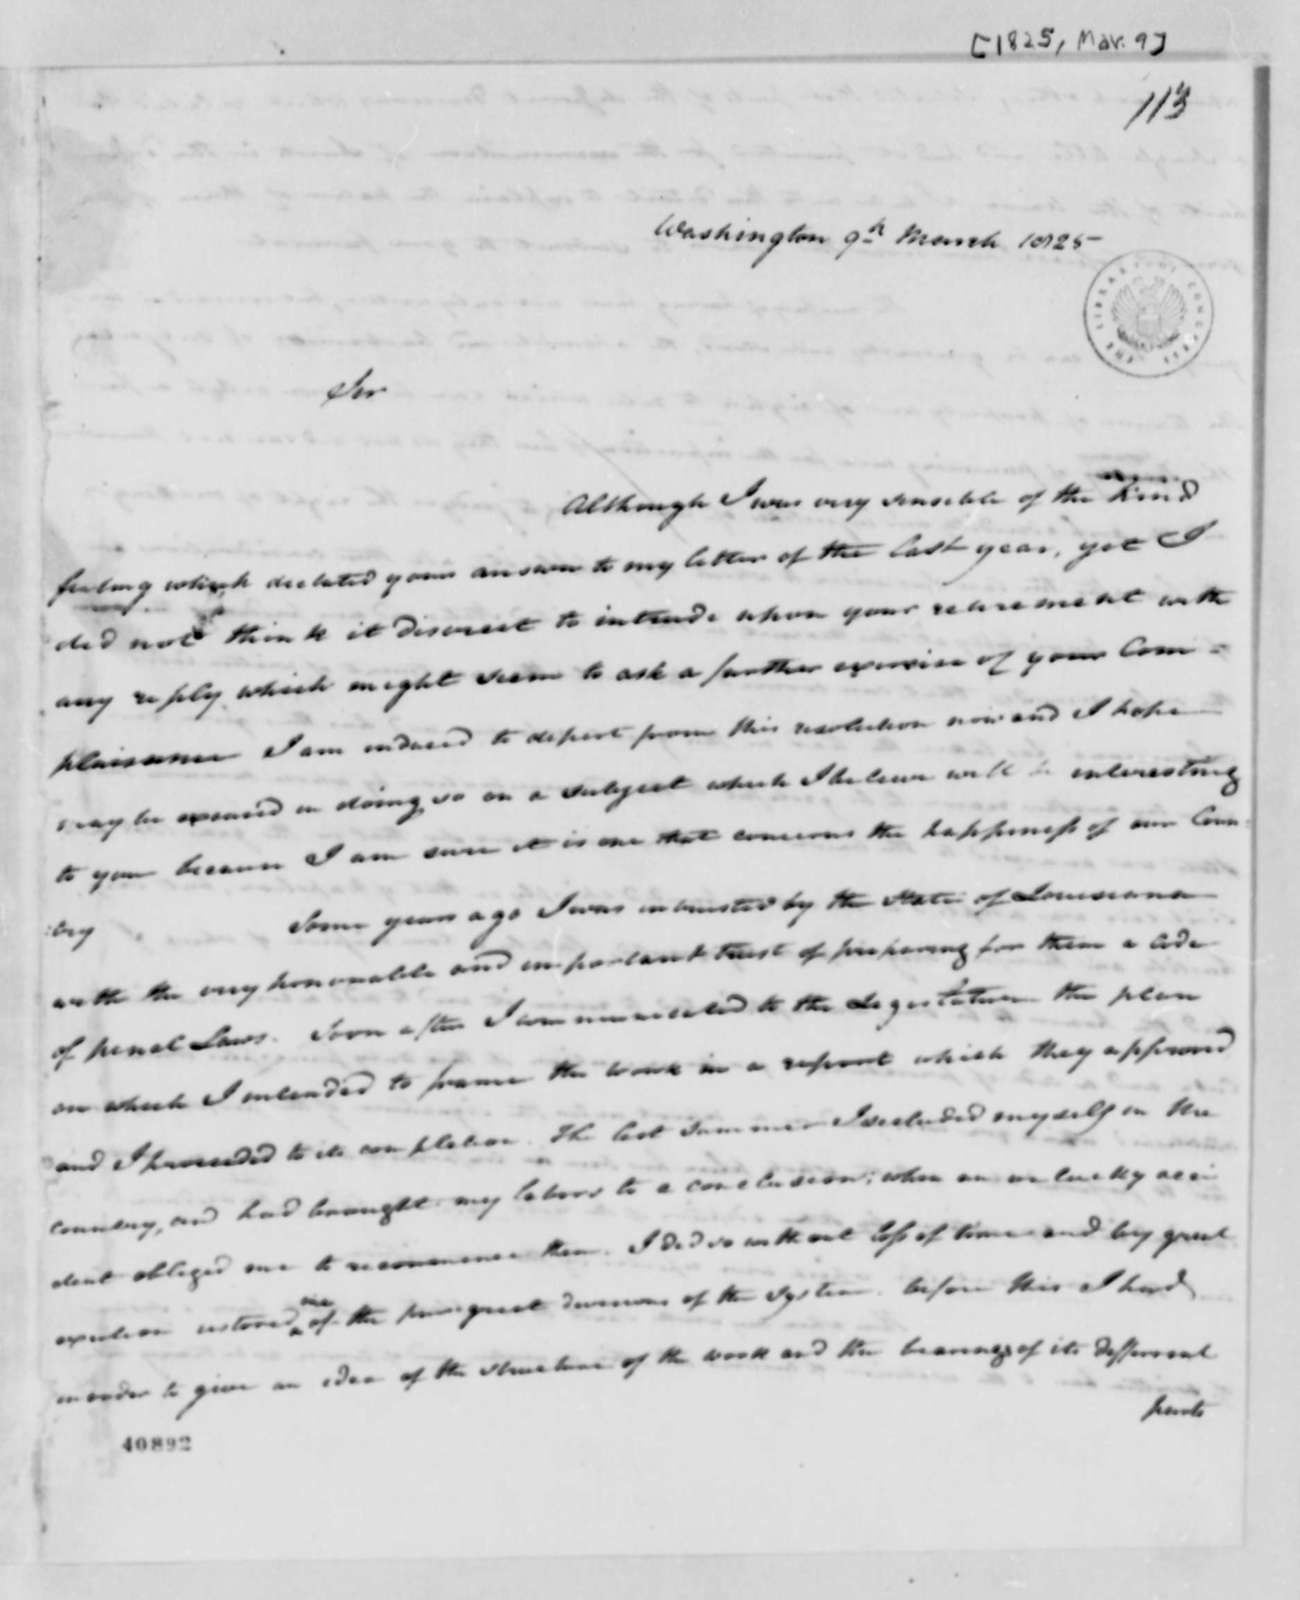 Edward Livingston to Thomas Jefferson, March 9, 1825